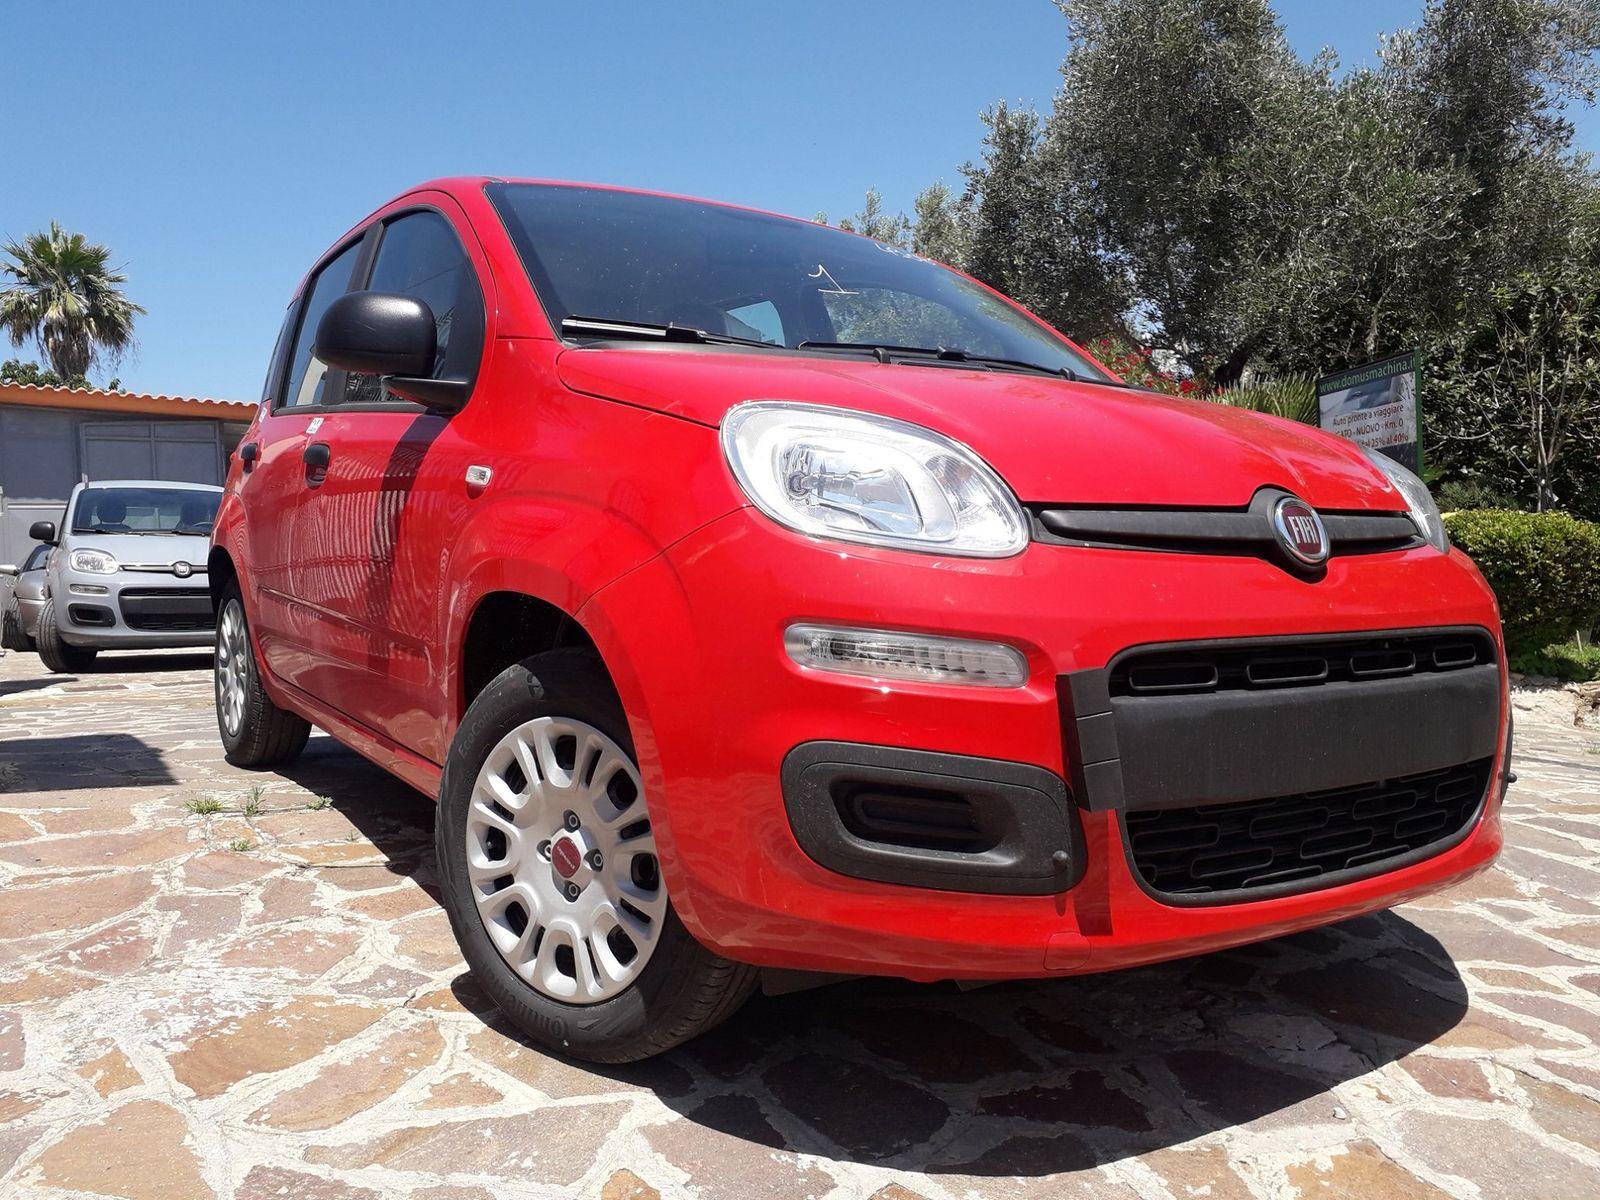 Panda Easy a km. 0, Italia, €. 9.550,00 + p.p.!